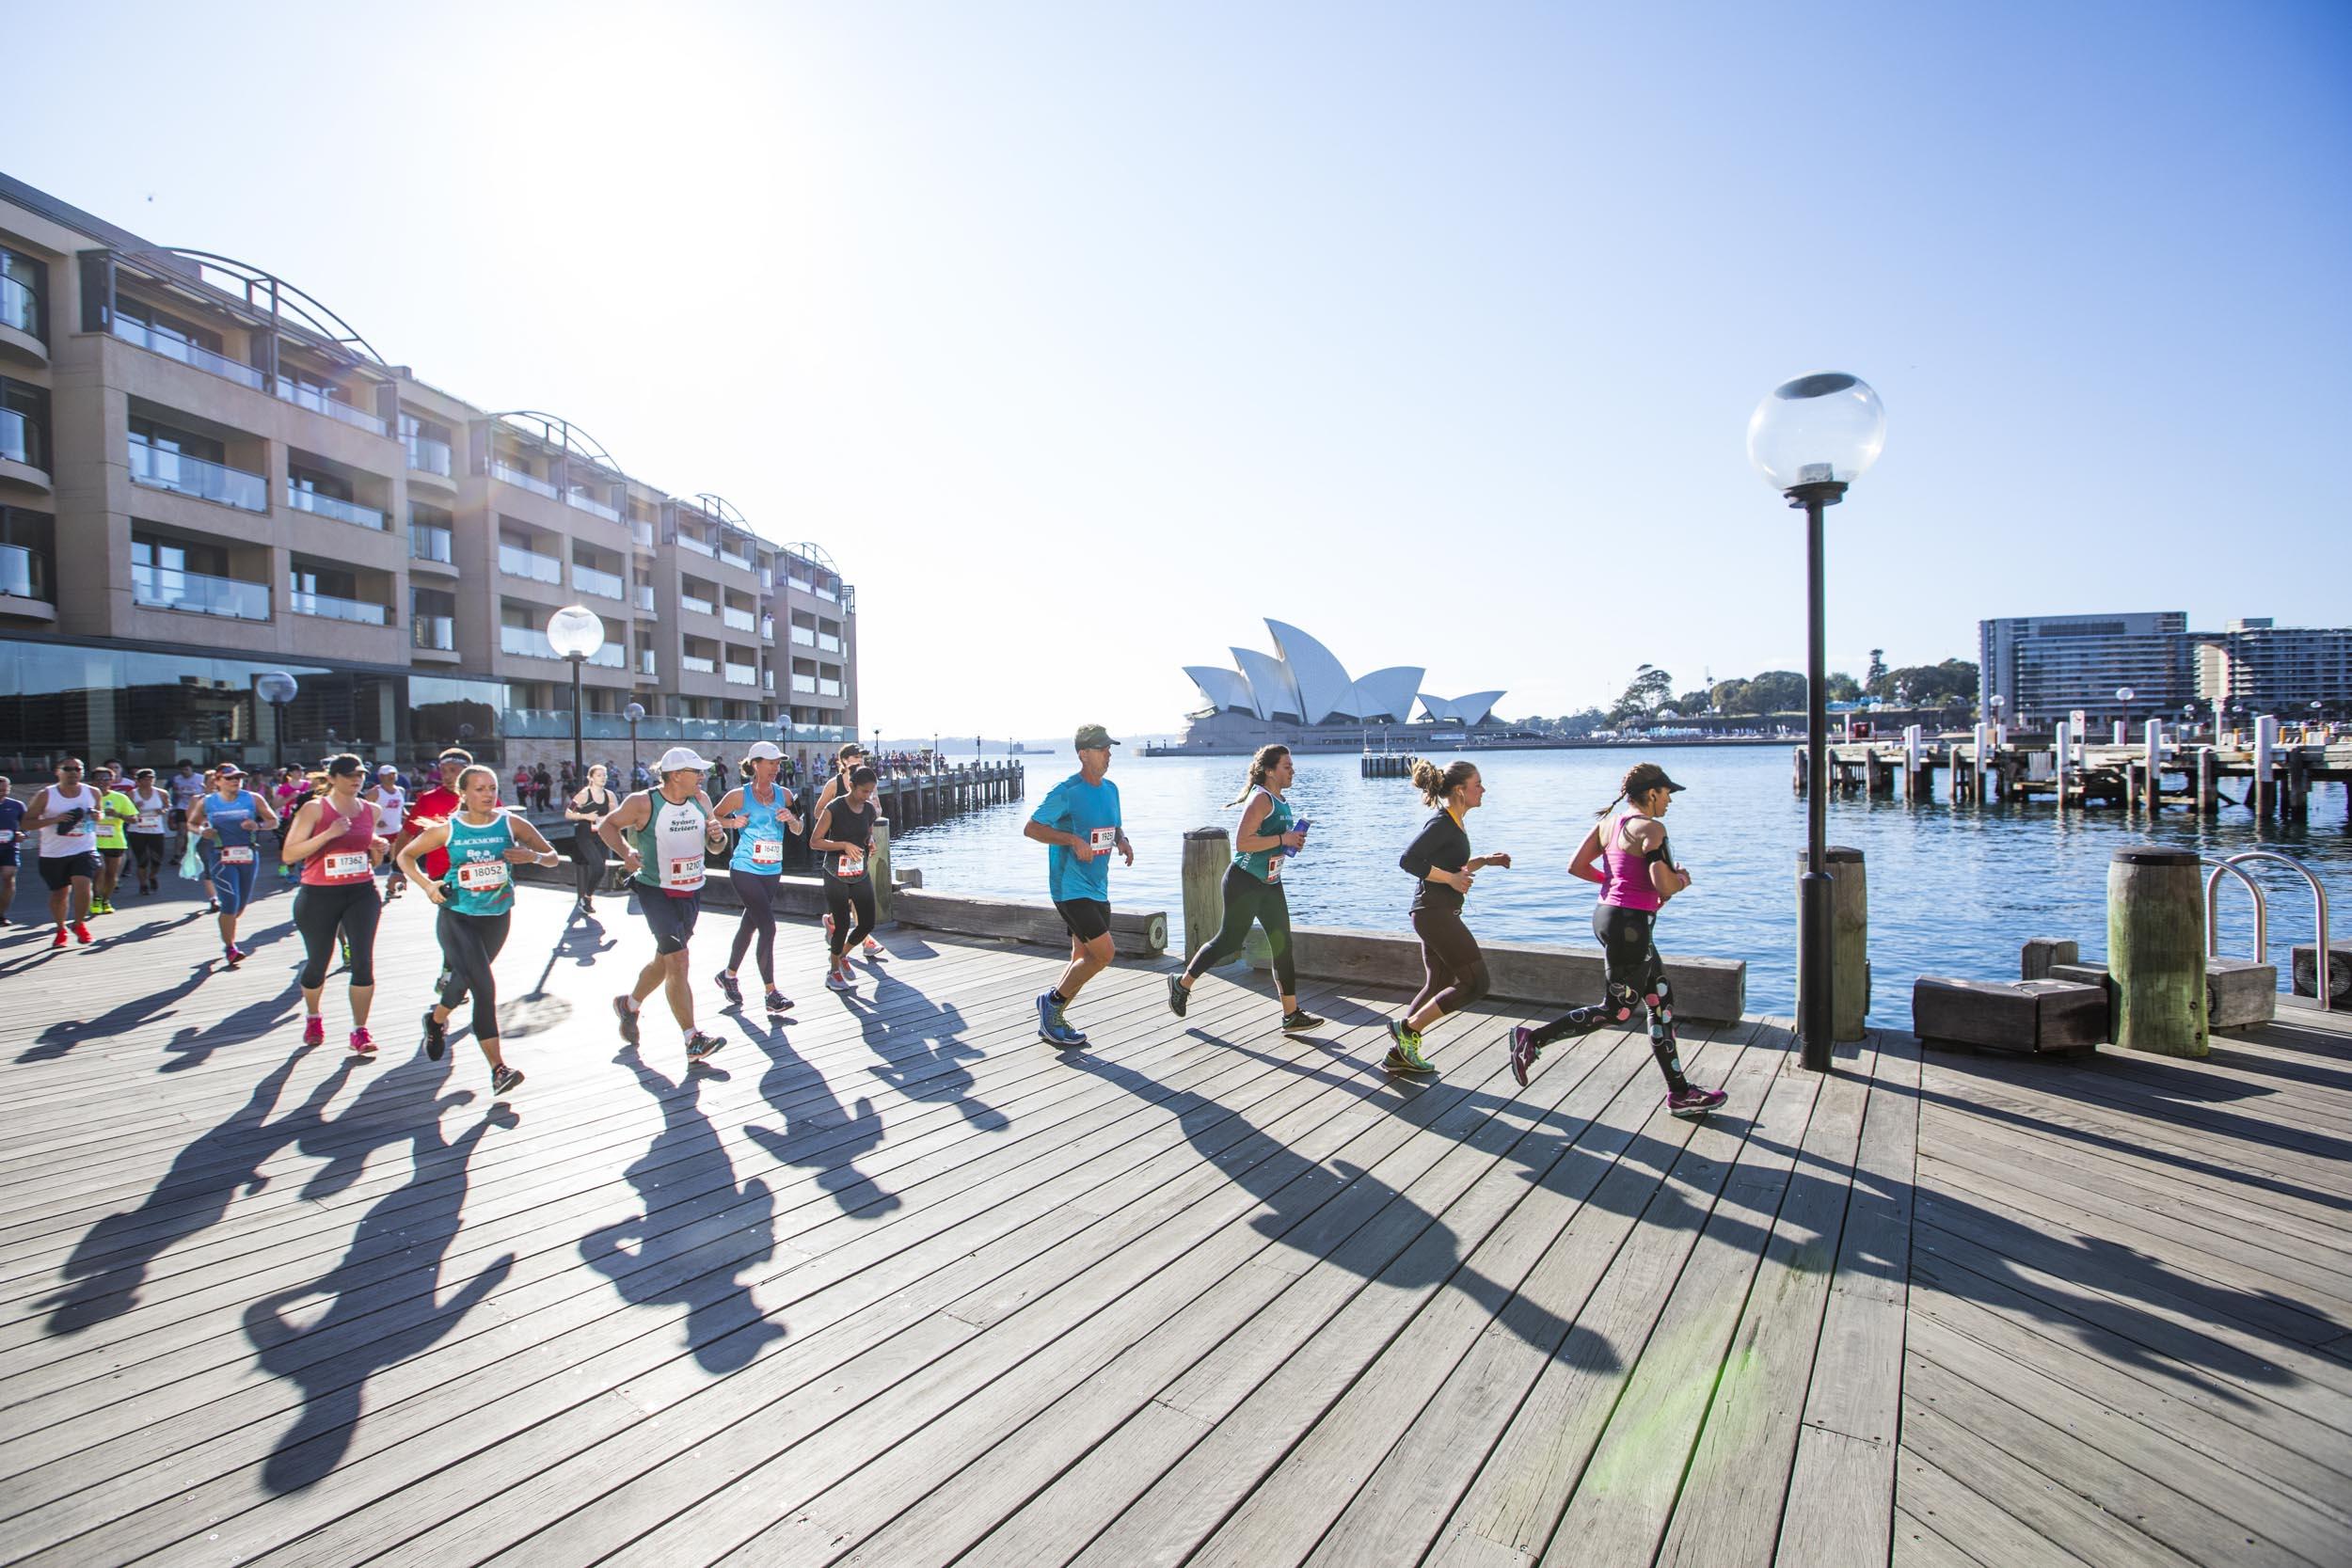 BSRF_20170917_(Sydney)__(BSRF)_CREDITDestinationNSW_DK--55.jpg